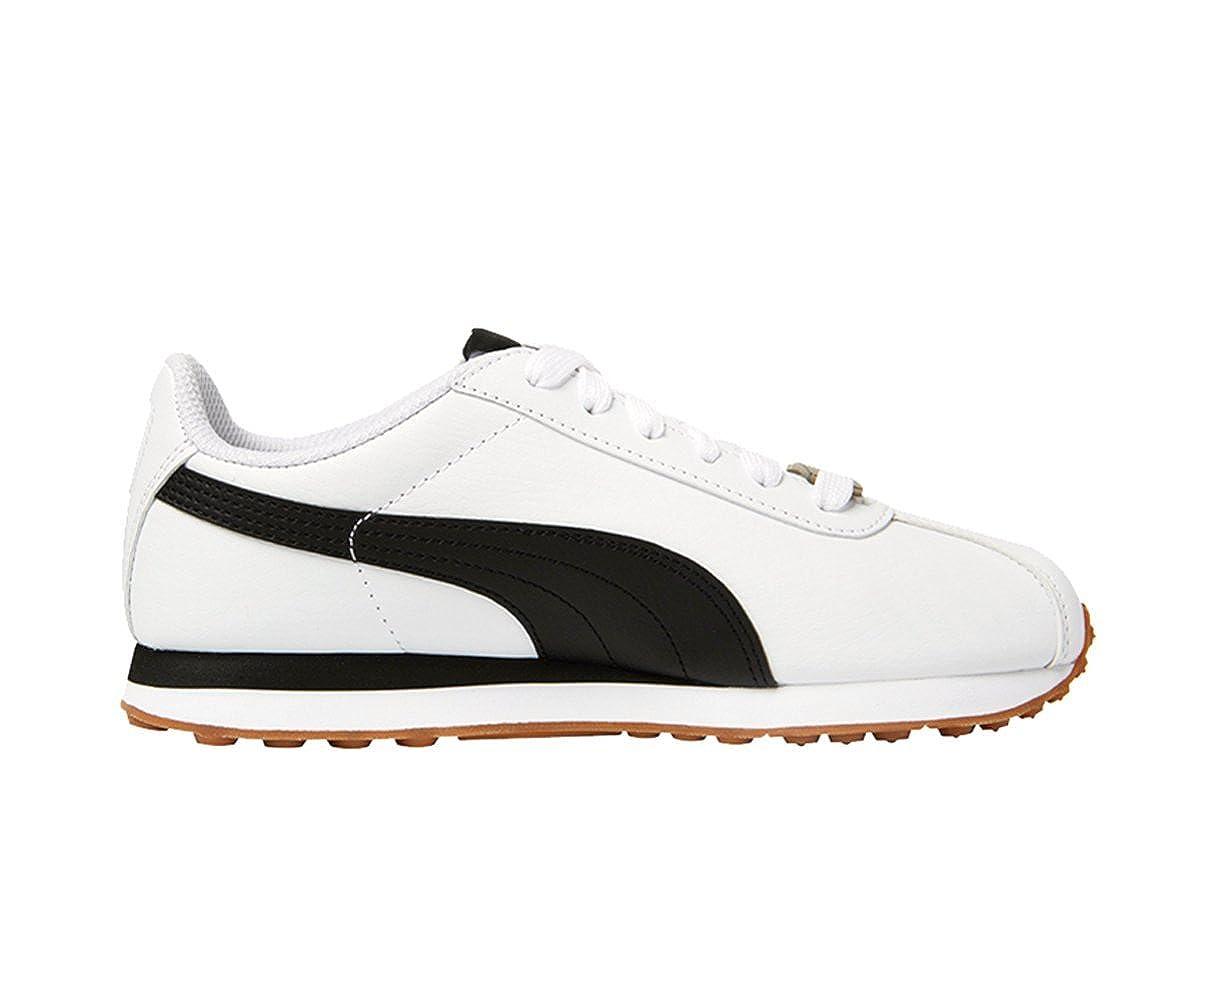 2be95323cf00 Amazon.com  PUMA BTS x New Collaboration Turin BTS  Shoes